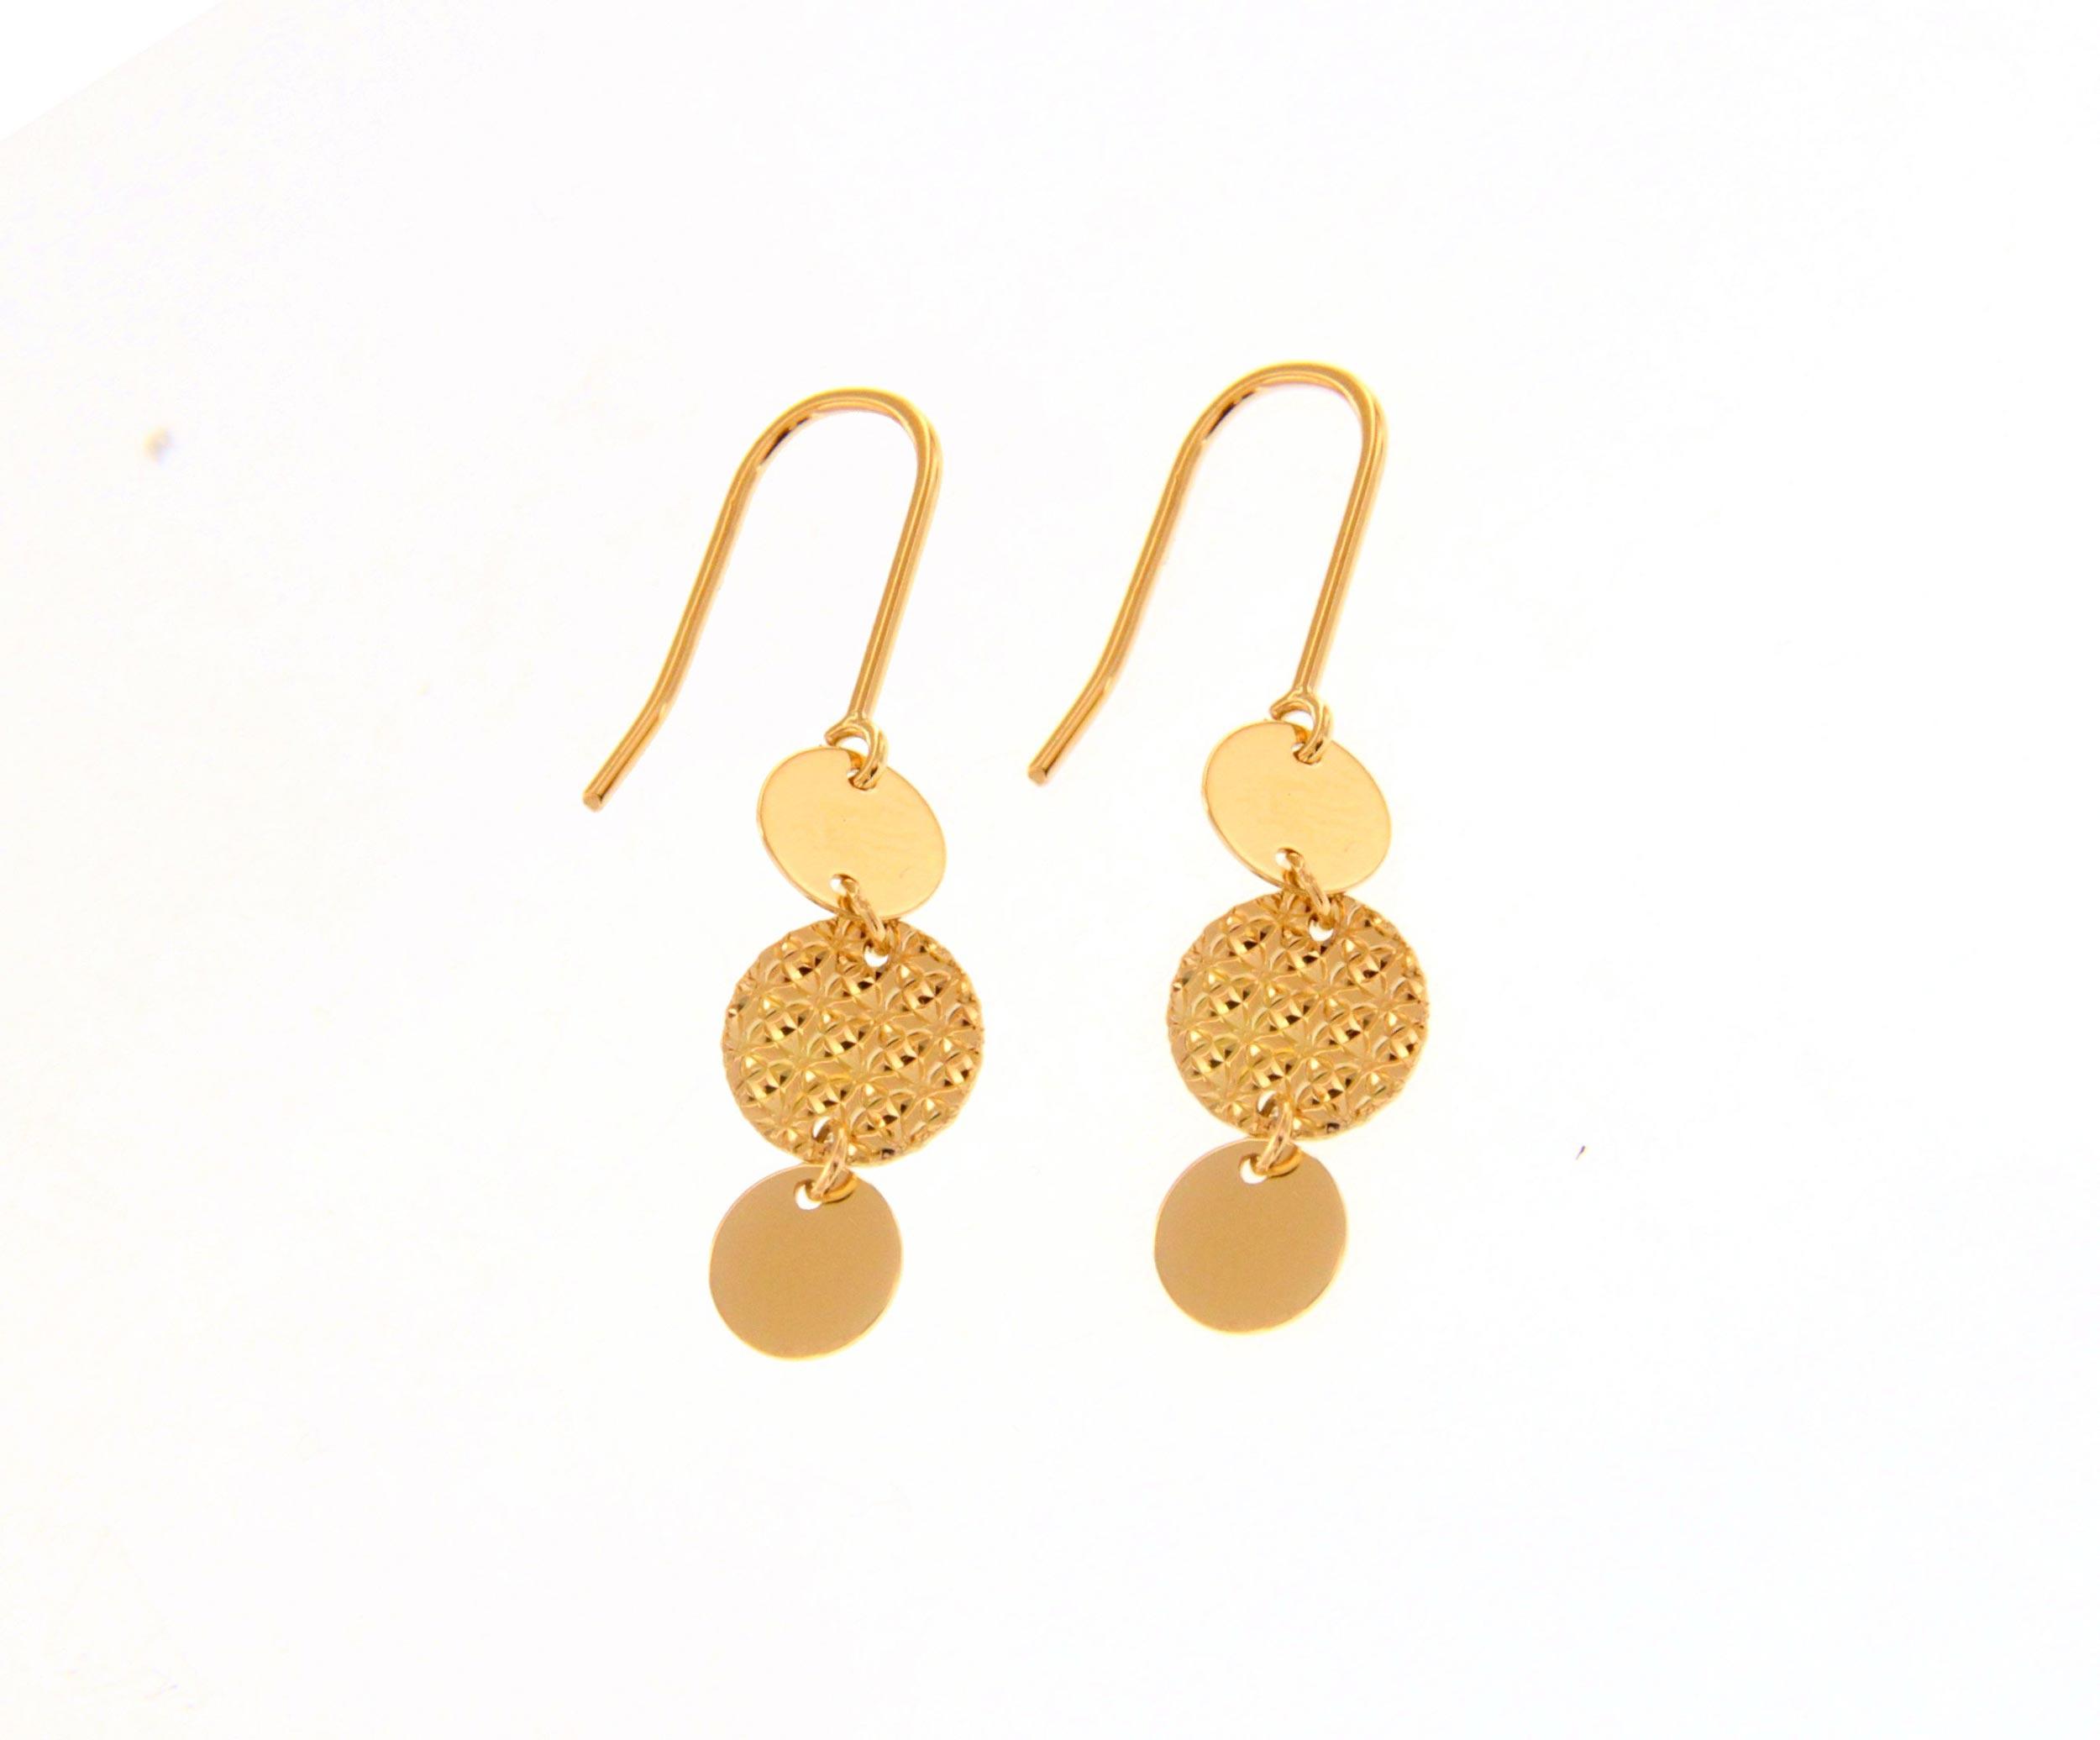 pendientes de gancho oro amarillo - aretes oro originales - gold earrings to buy online - joyeria marga mira